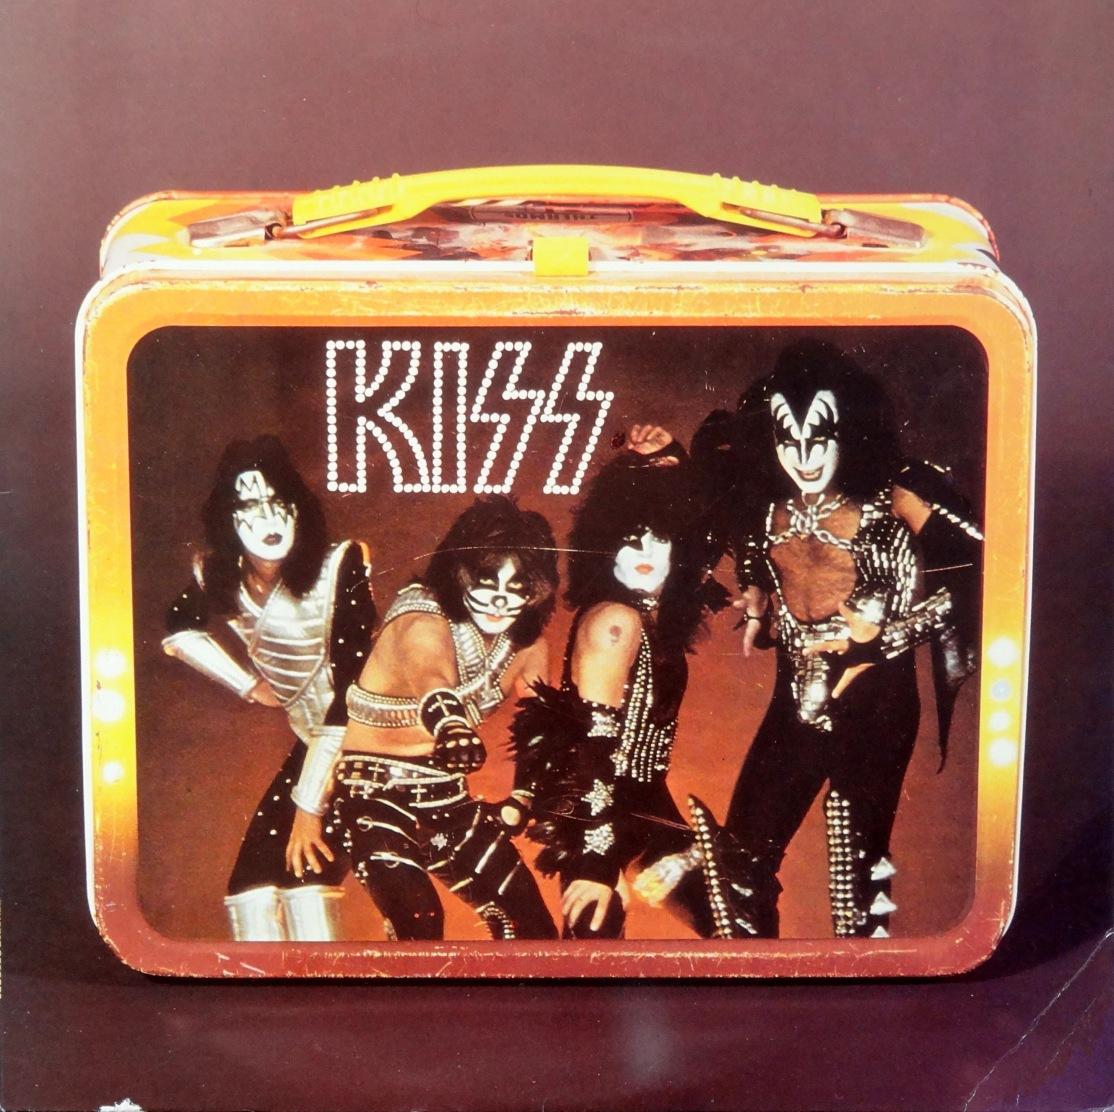 KISS London 1978 front